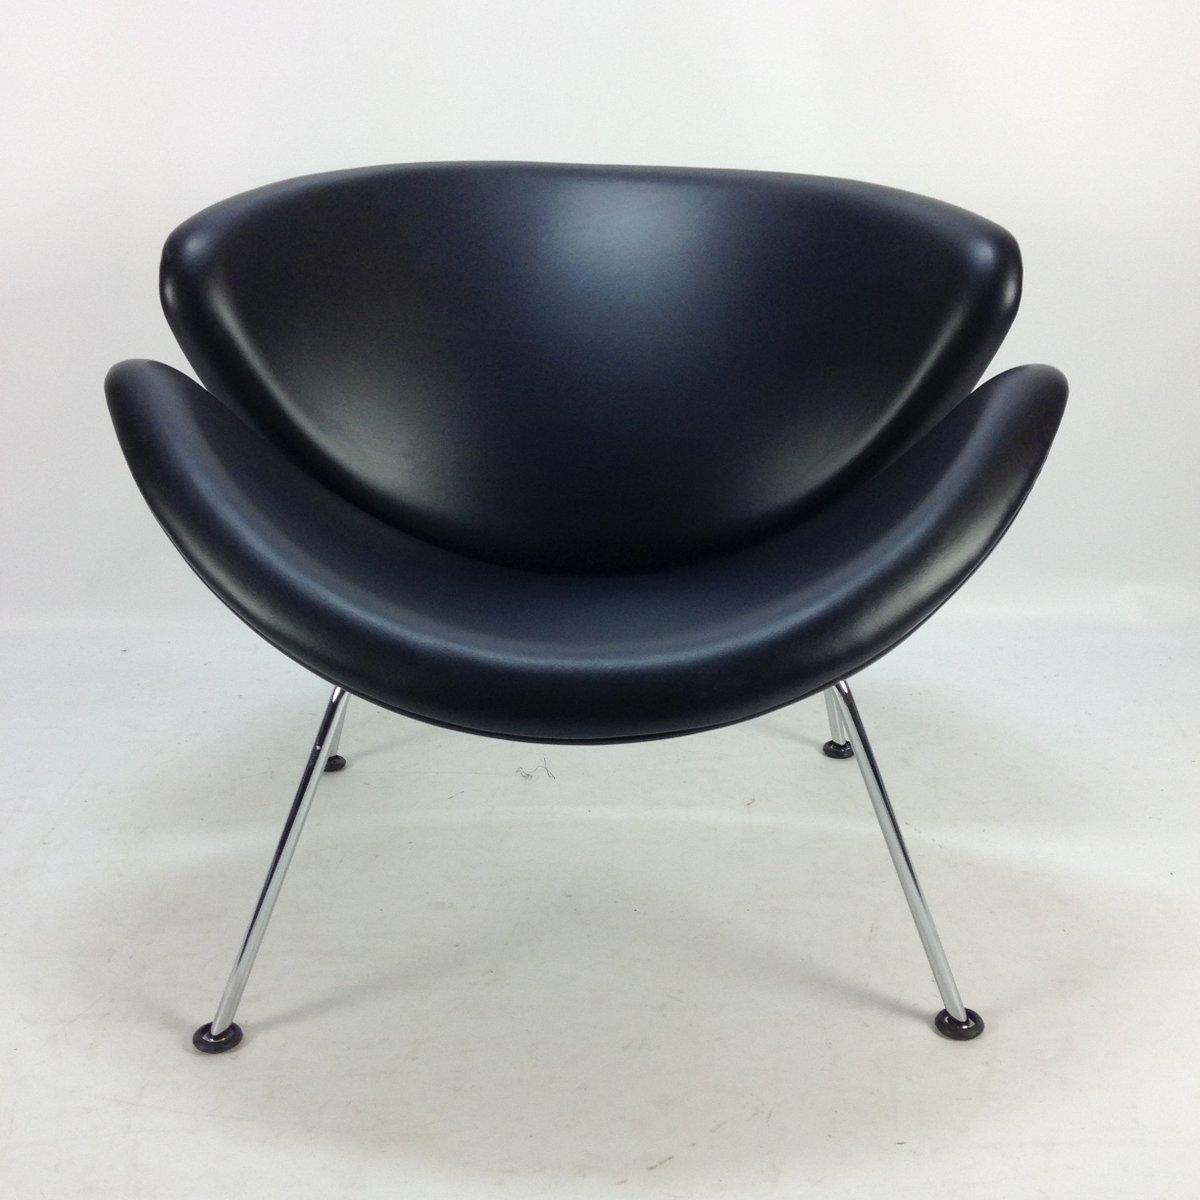 Orange Slice Lounge Chair by Pierre Paulin for Artifort, 1960s